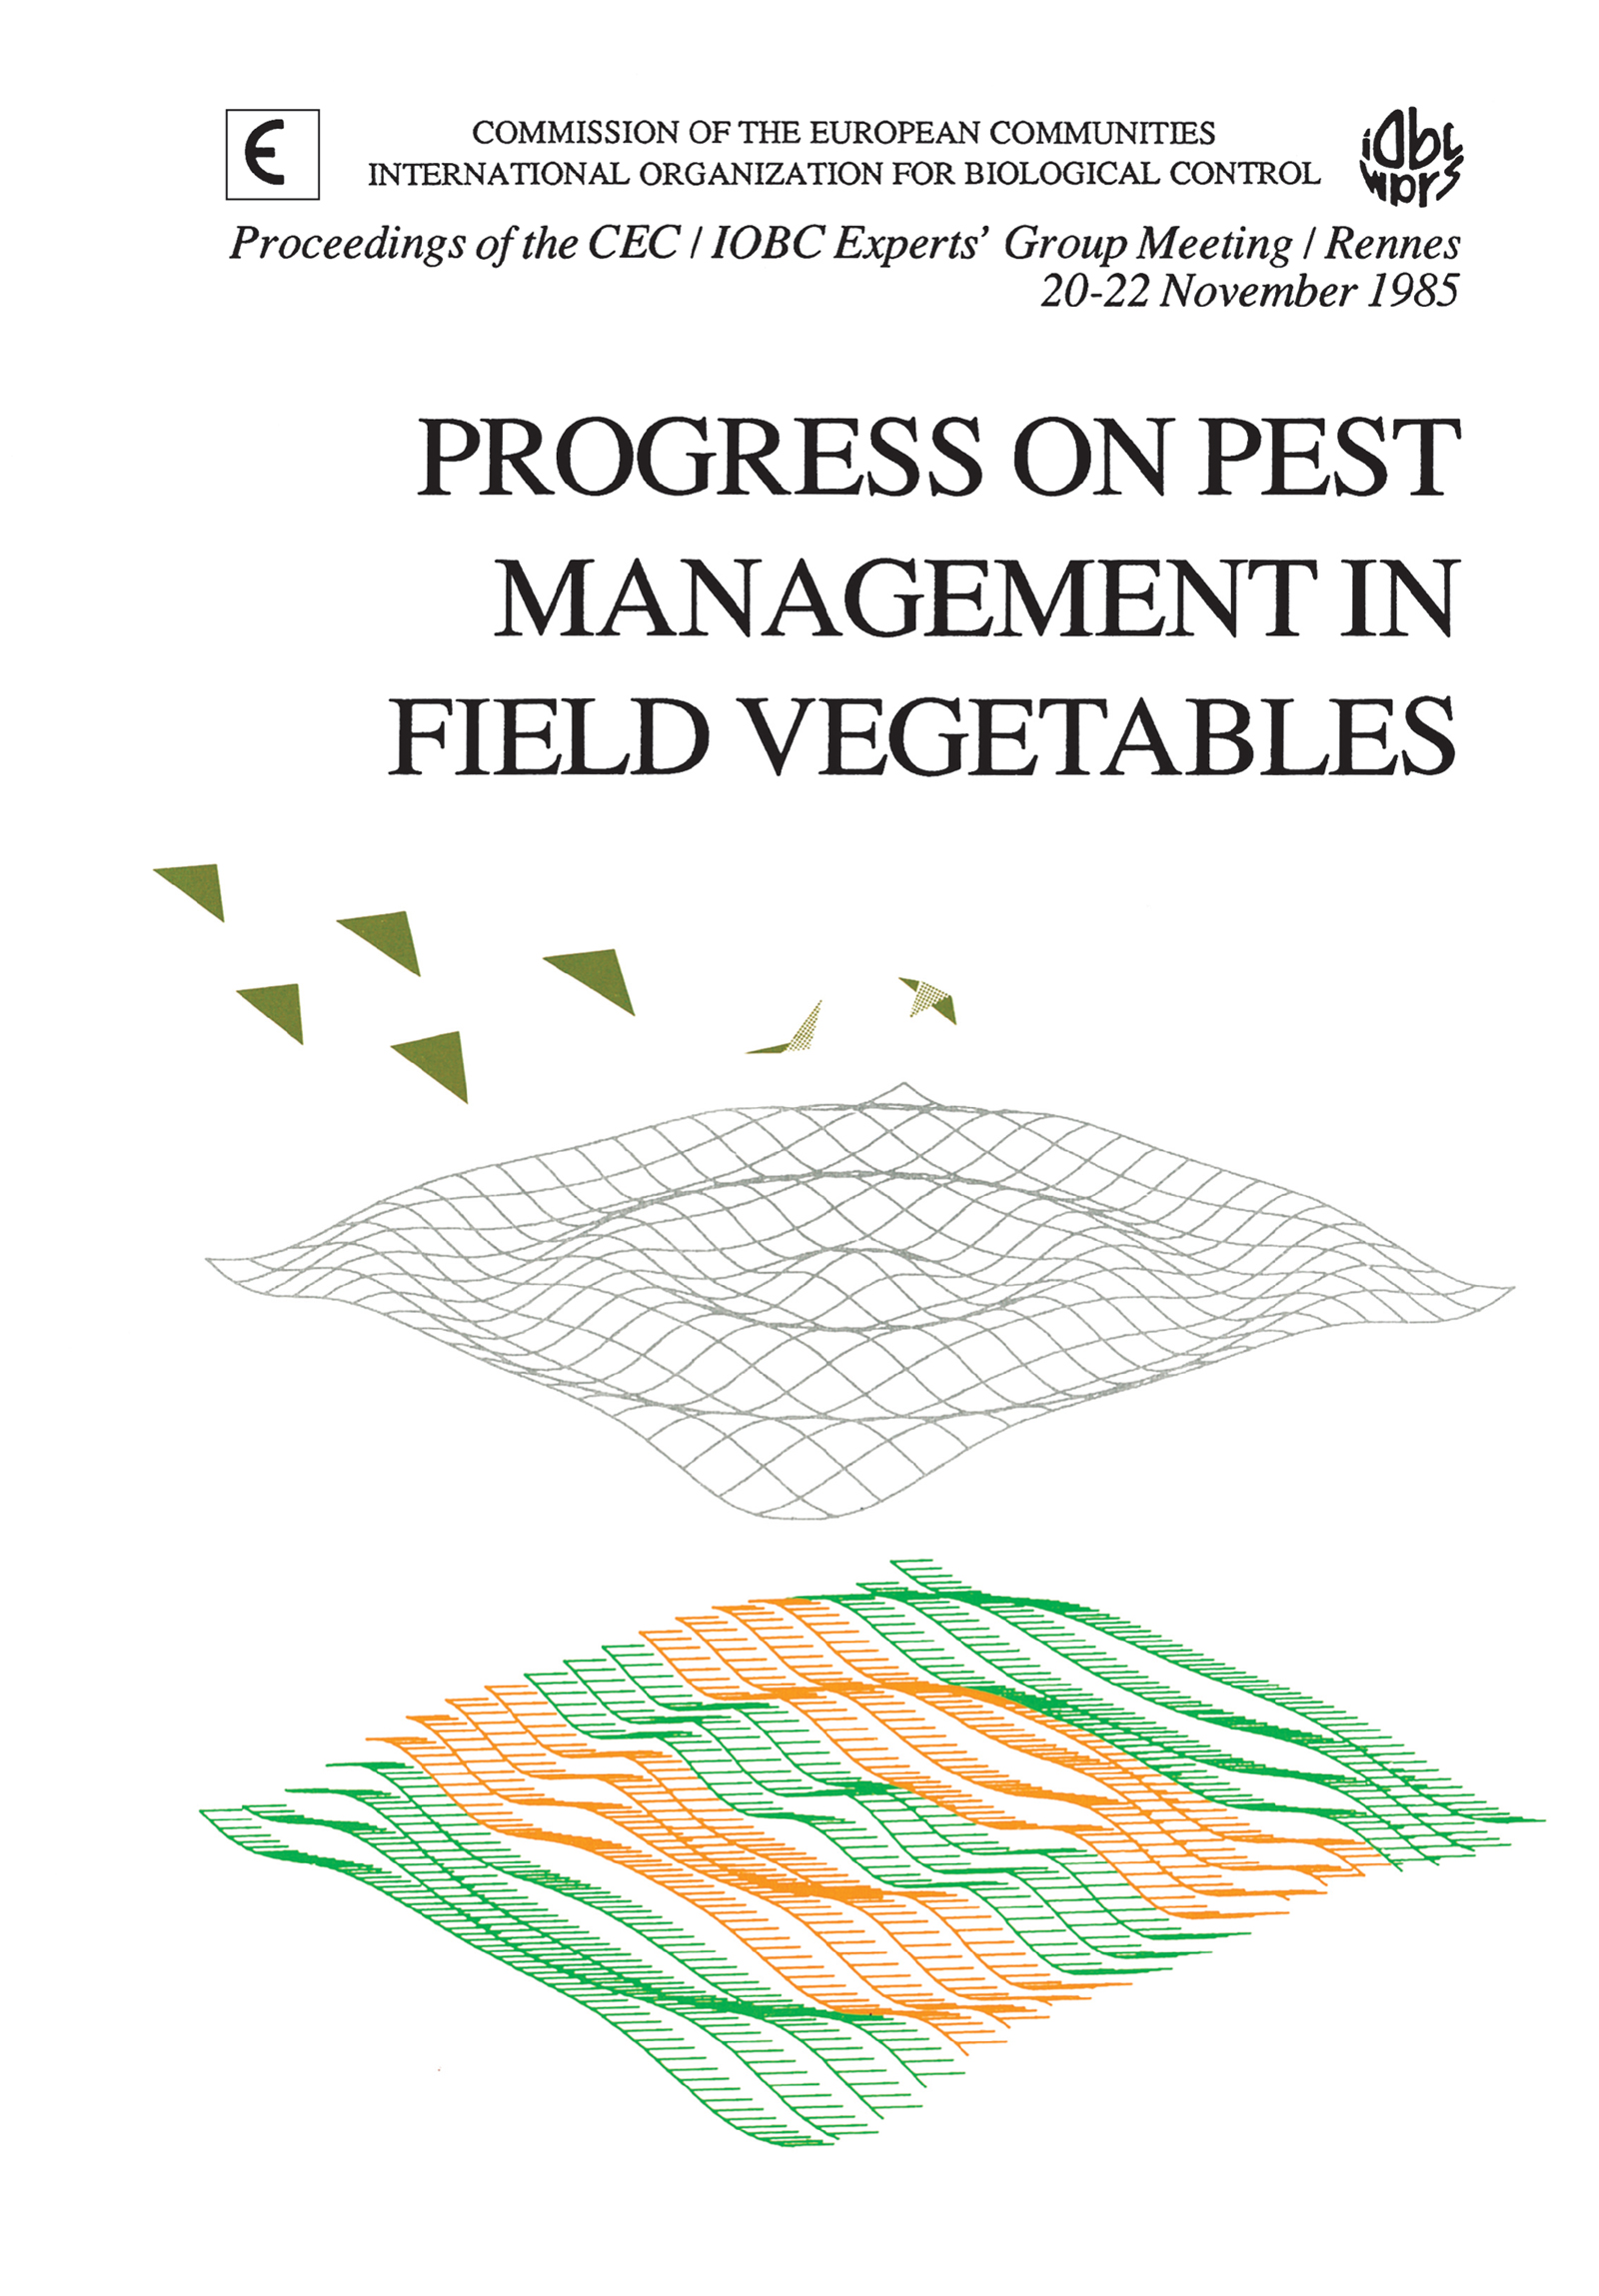 Progress on Pest Management in Field Vegetables